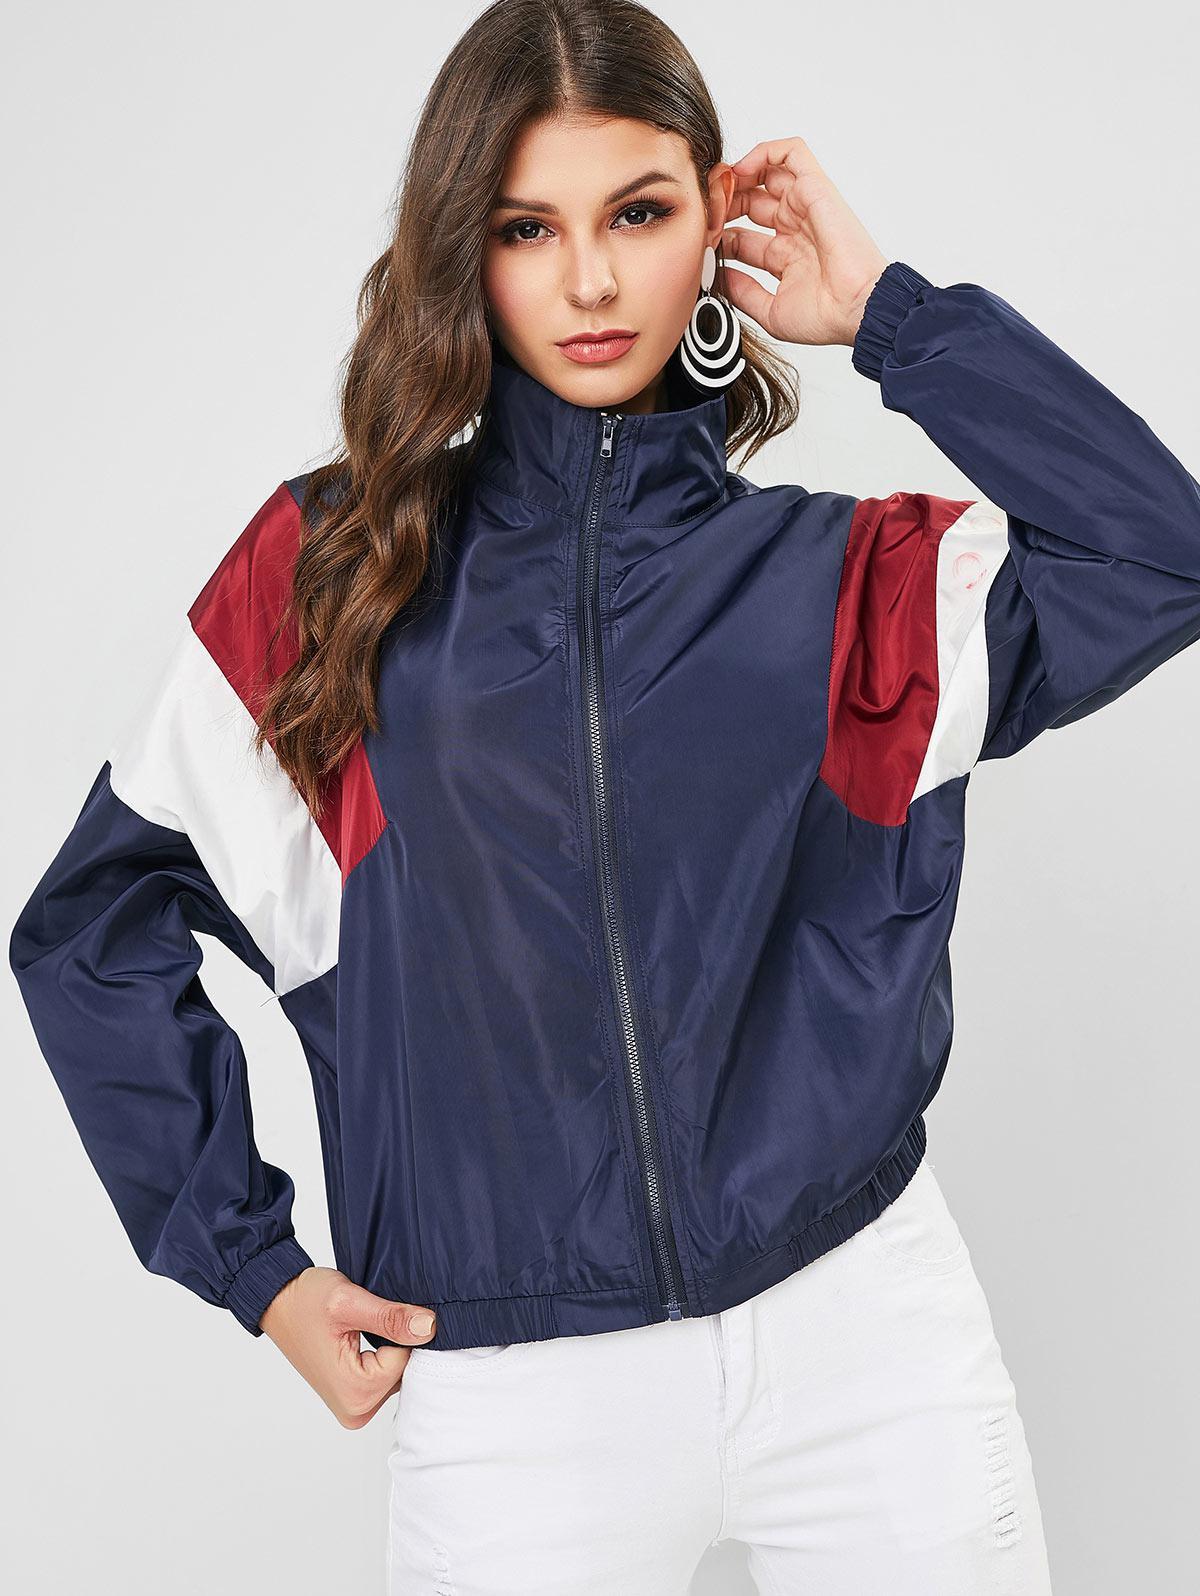 ZAFUL Colorblock Zip Up Loose Windbreaker Jacket